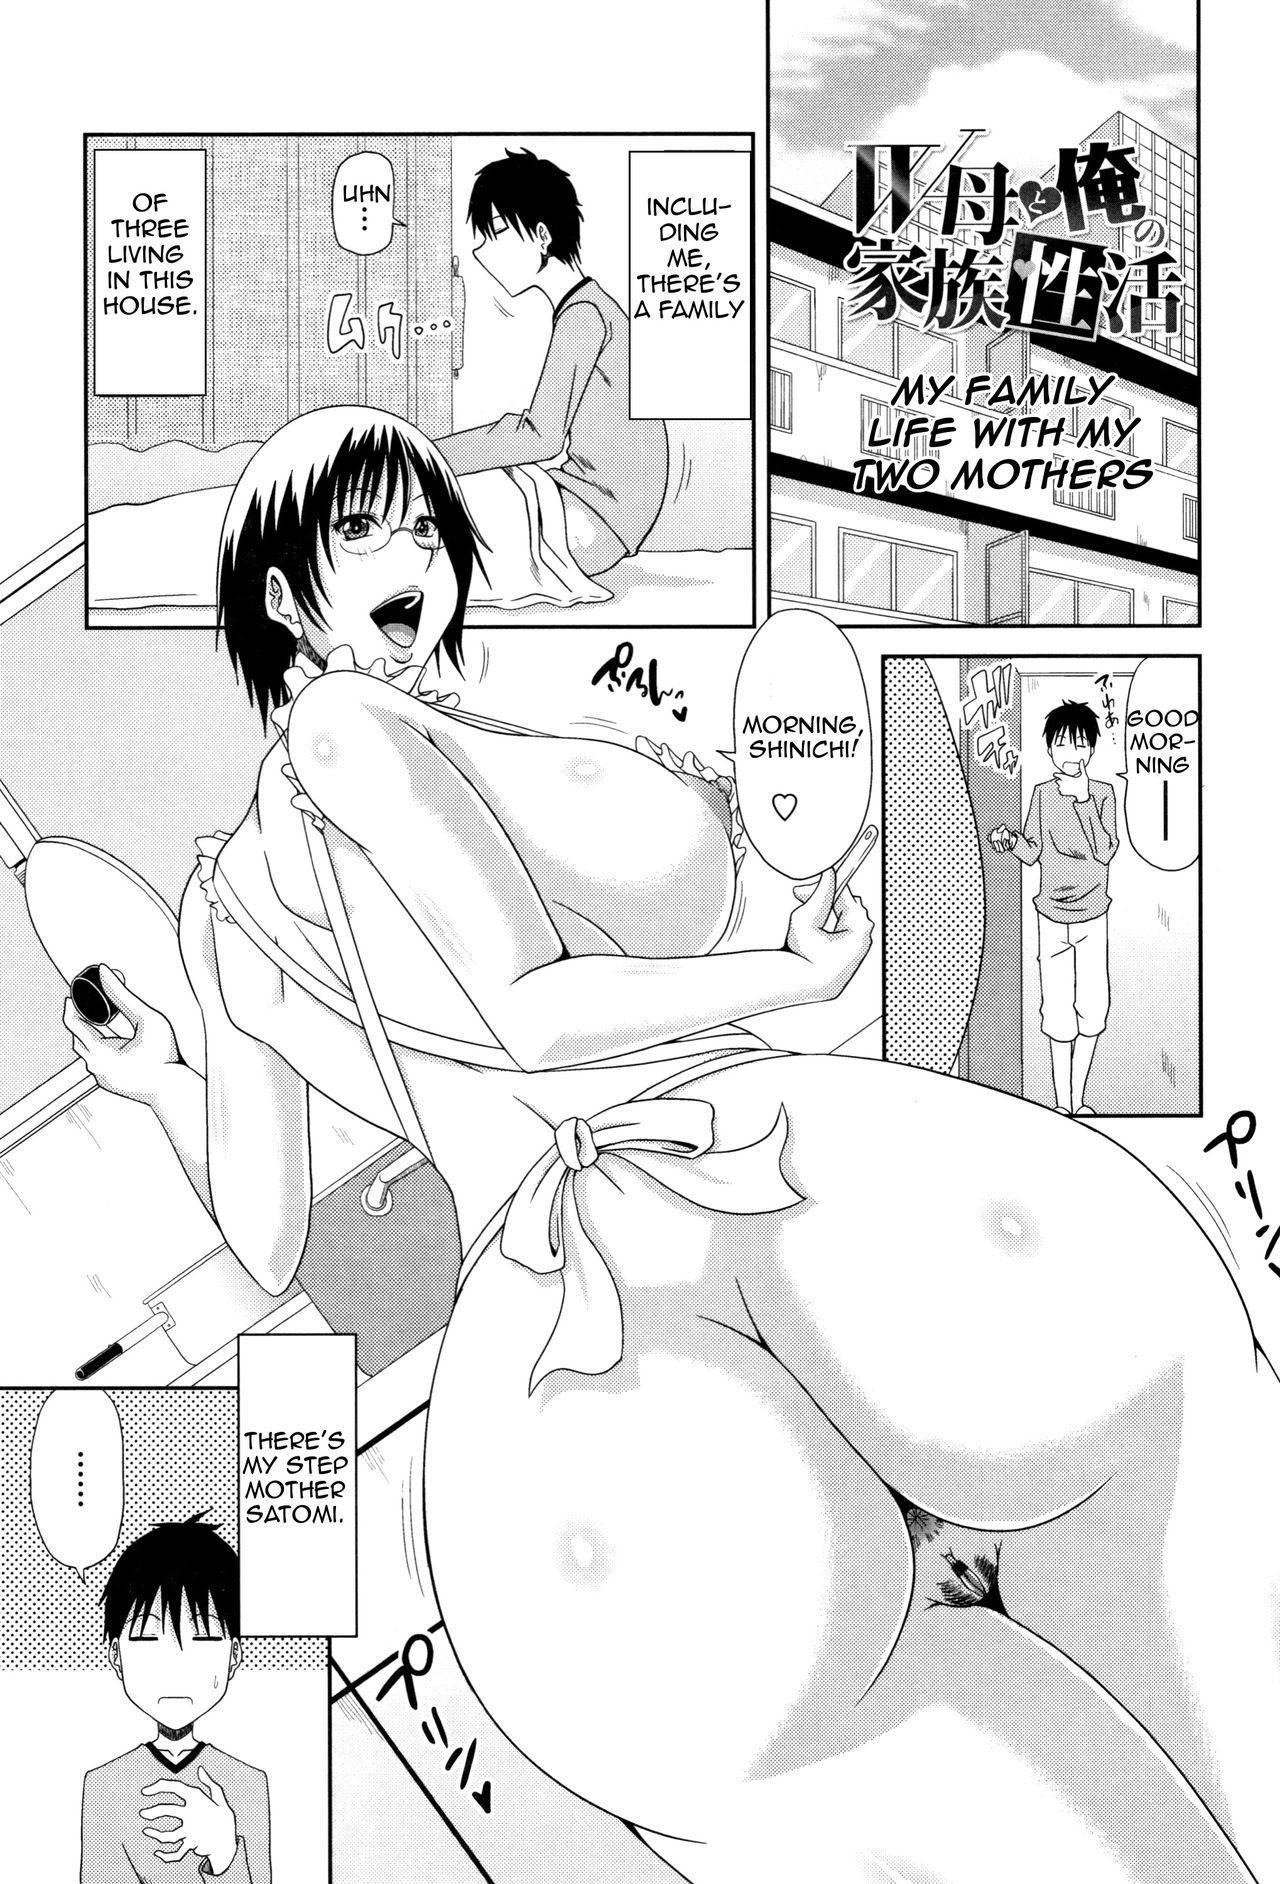 WHaha to Ore no Kazoku Seikatsu | My Family Life with My Two Mothers 0